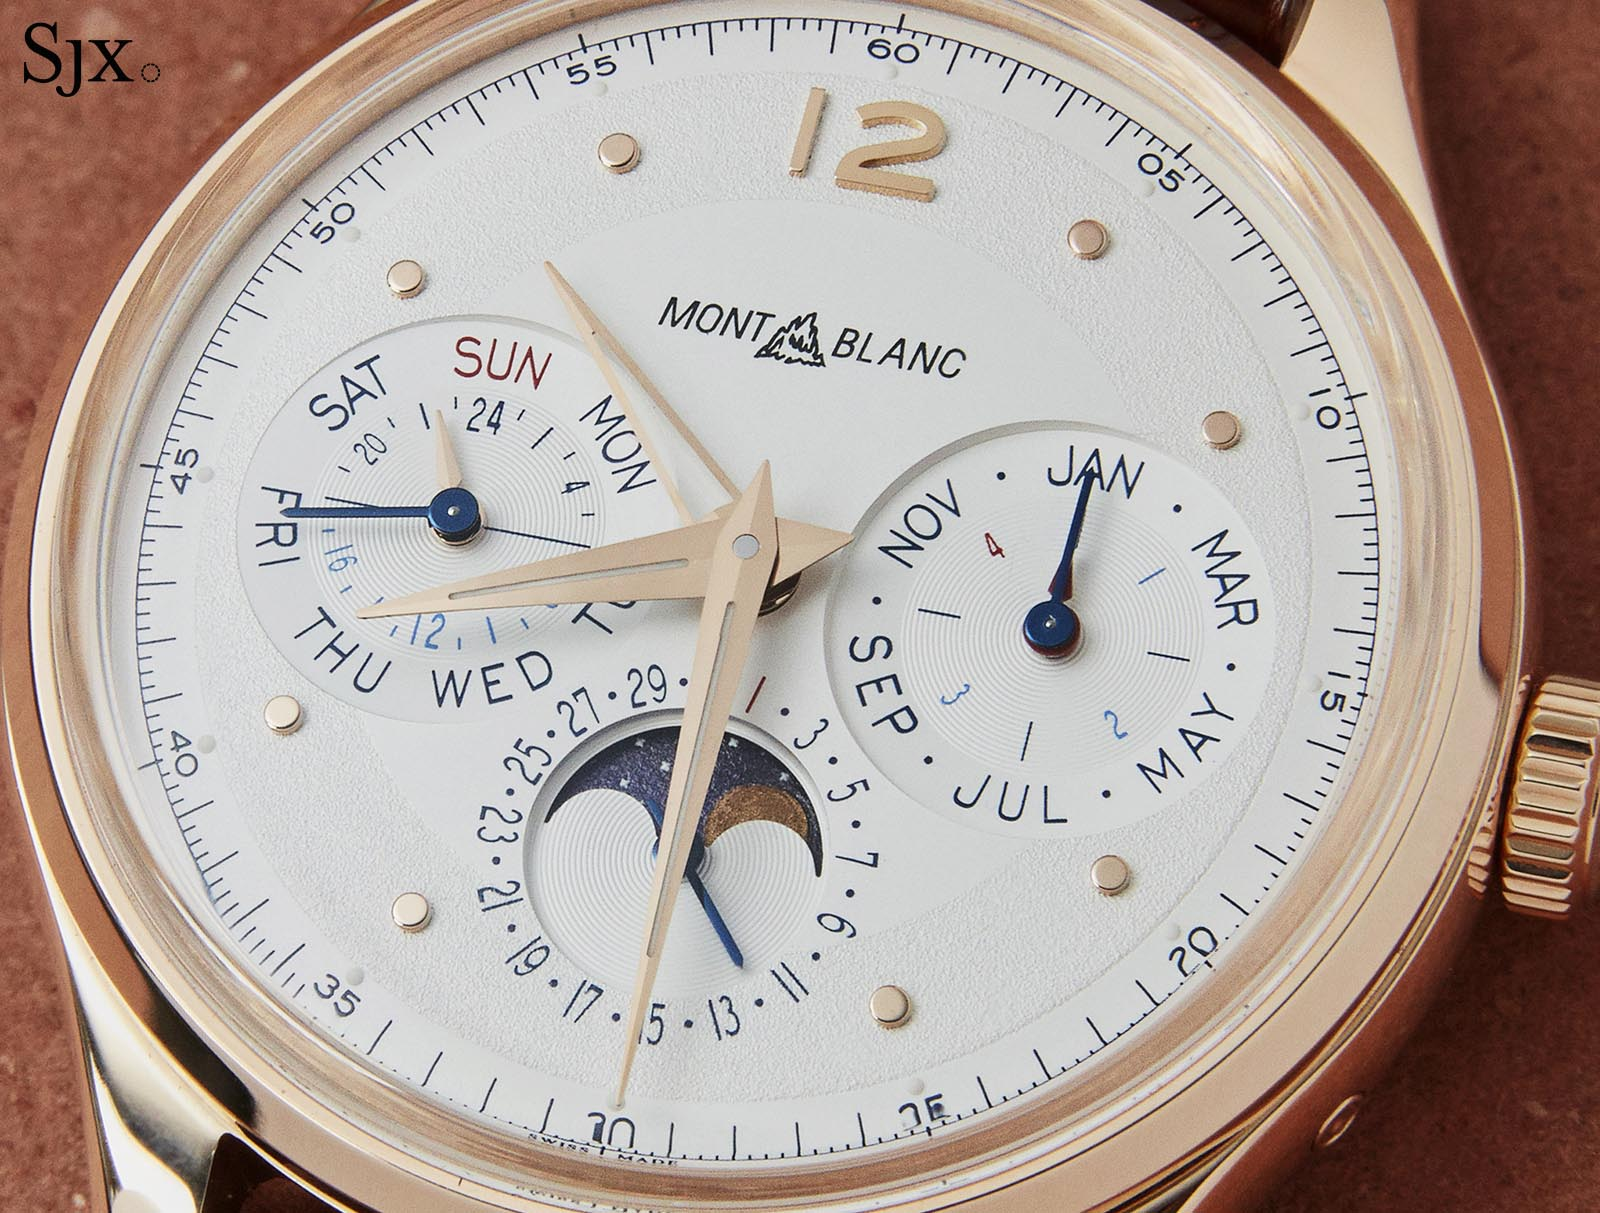 Montblanc Heritage Manufacture Perpetual Calendar 5